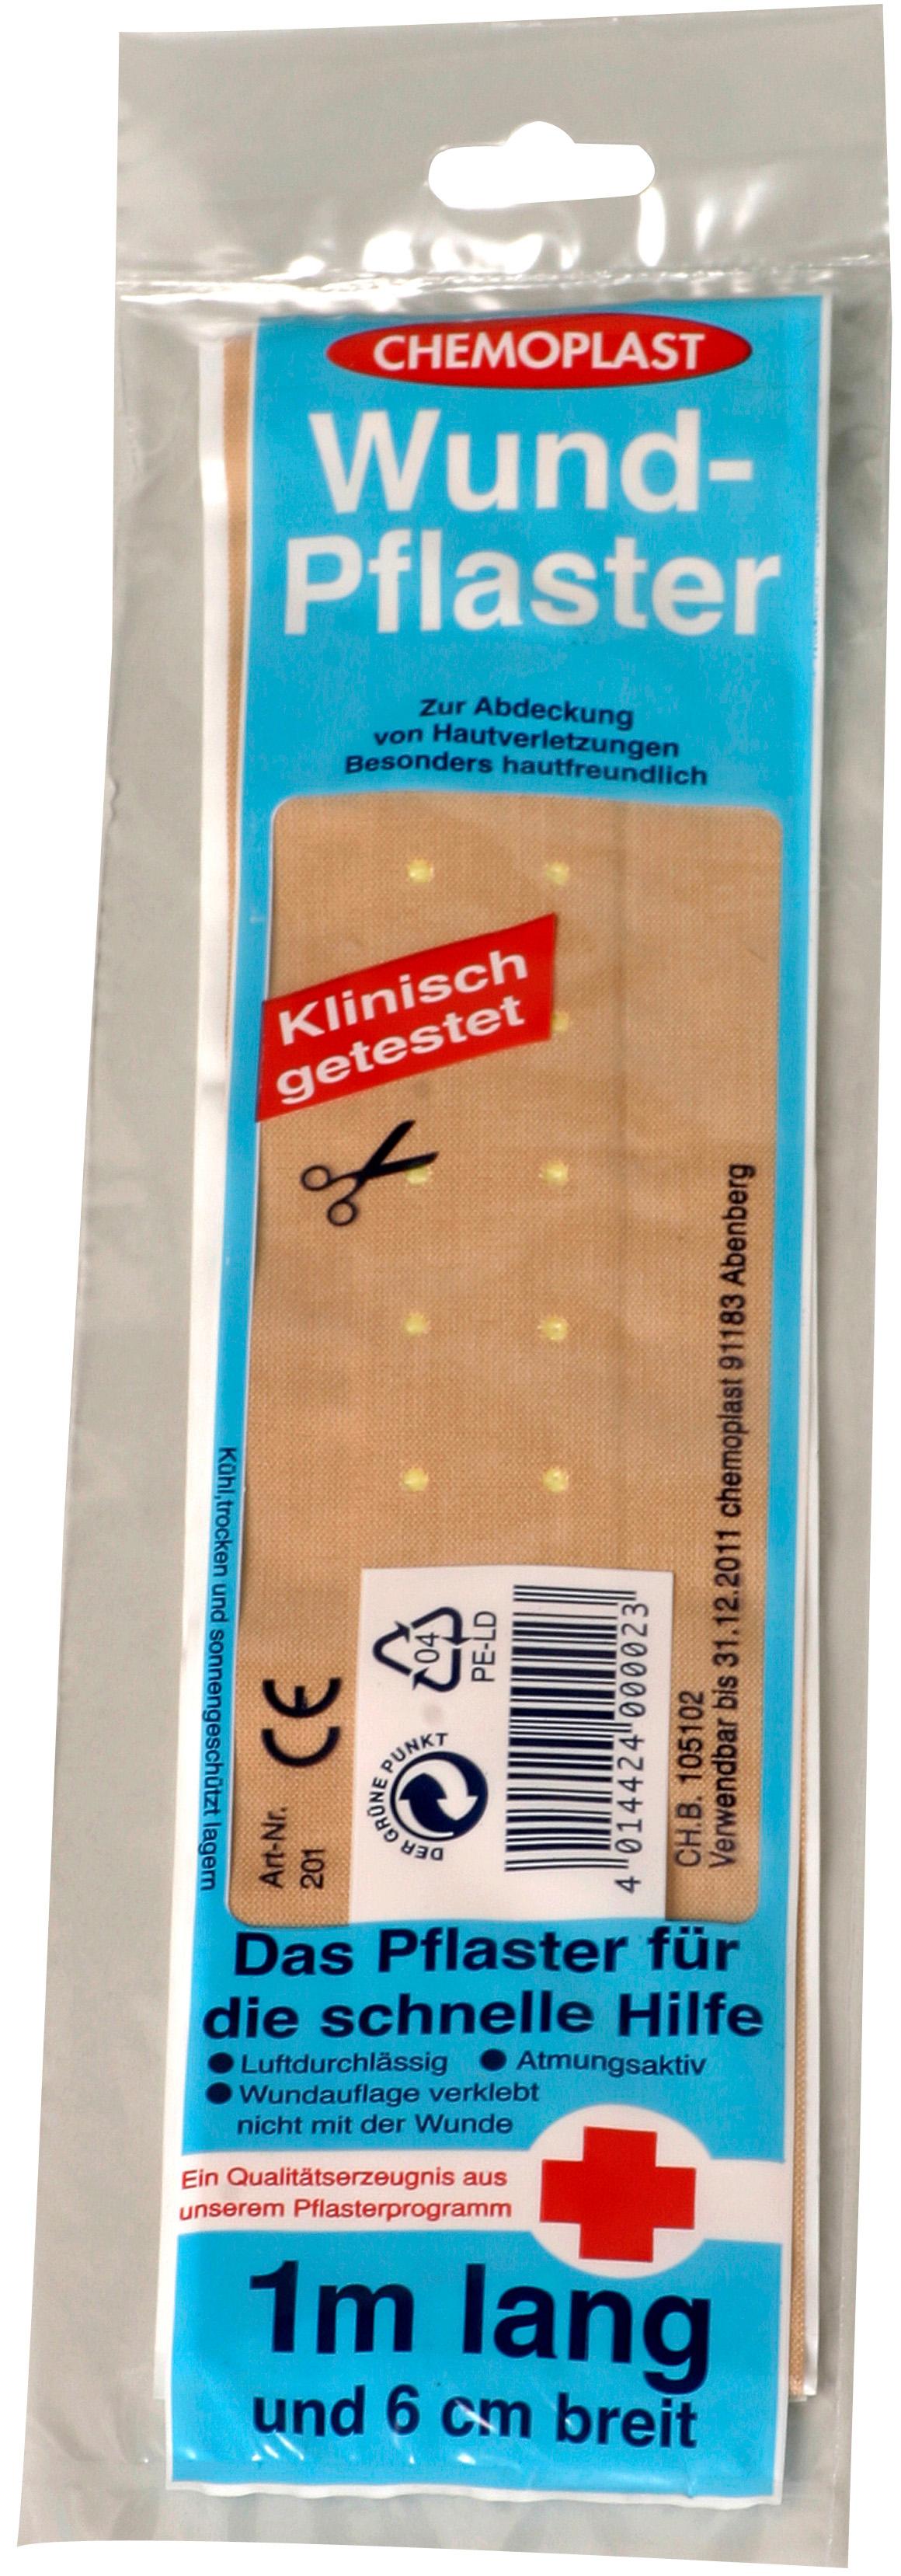 01794 - Wundpflaster 1 m x 6 cm